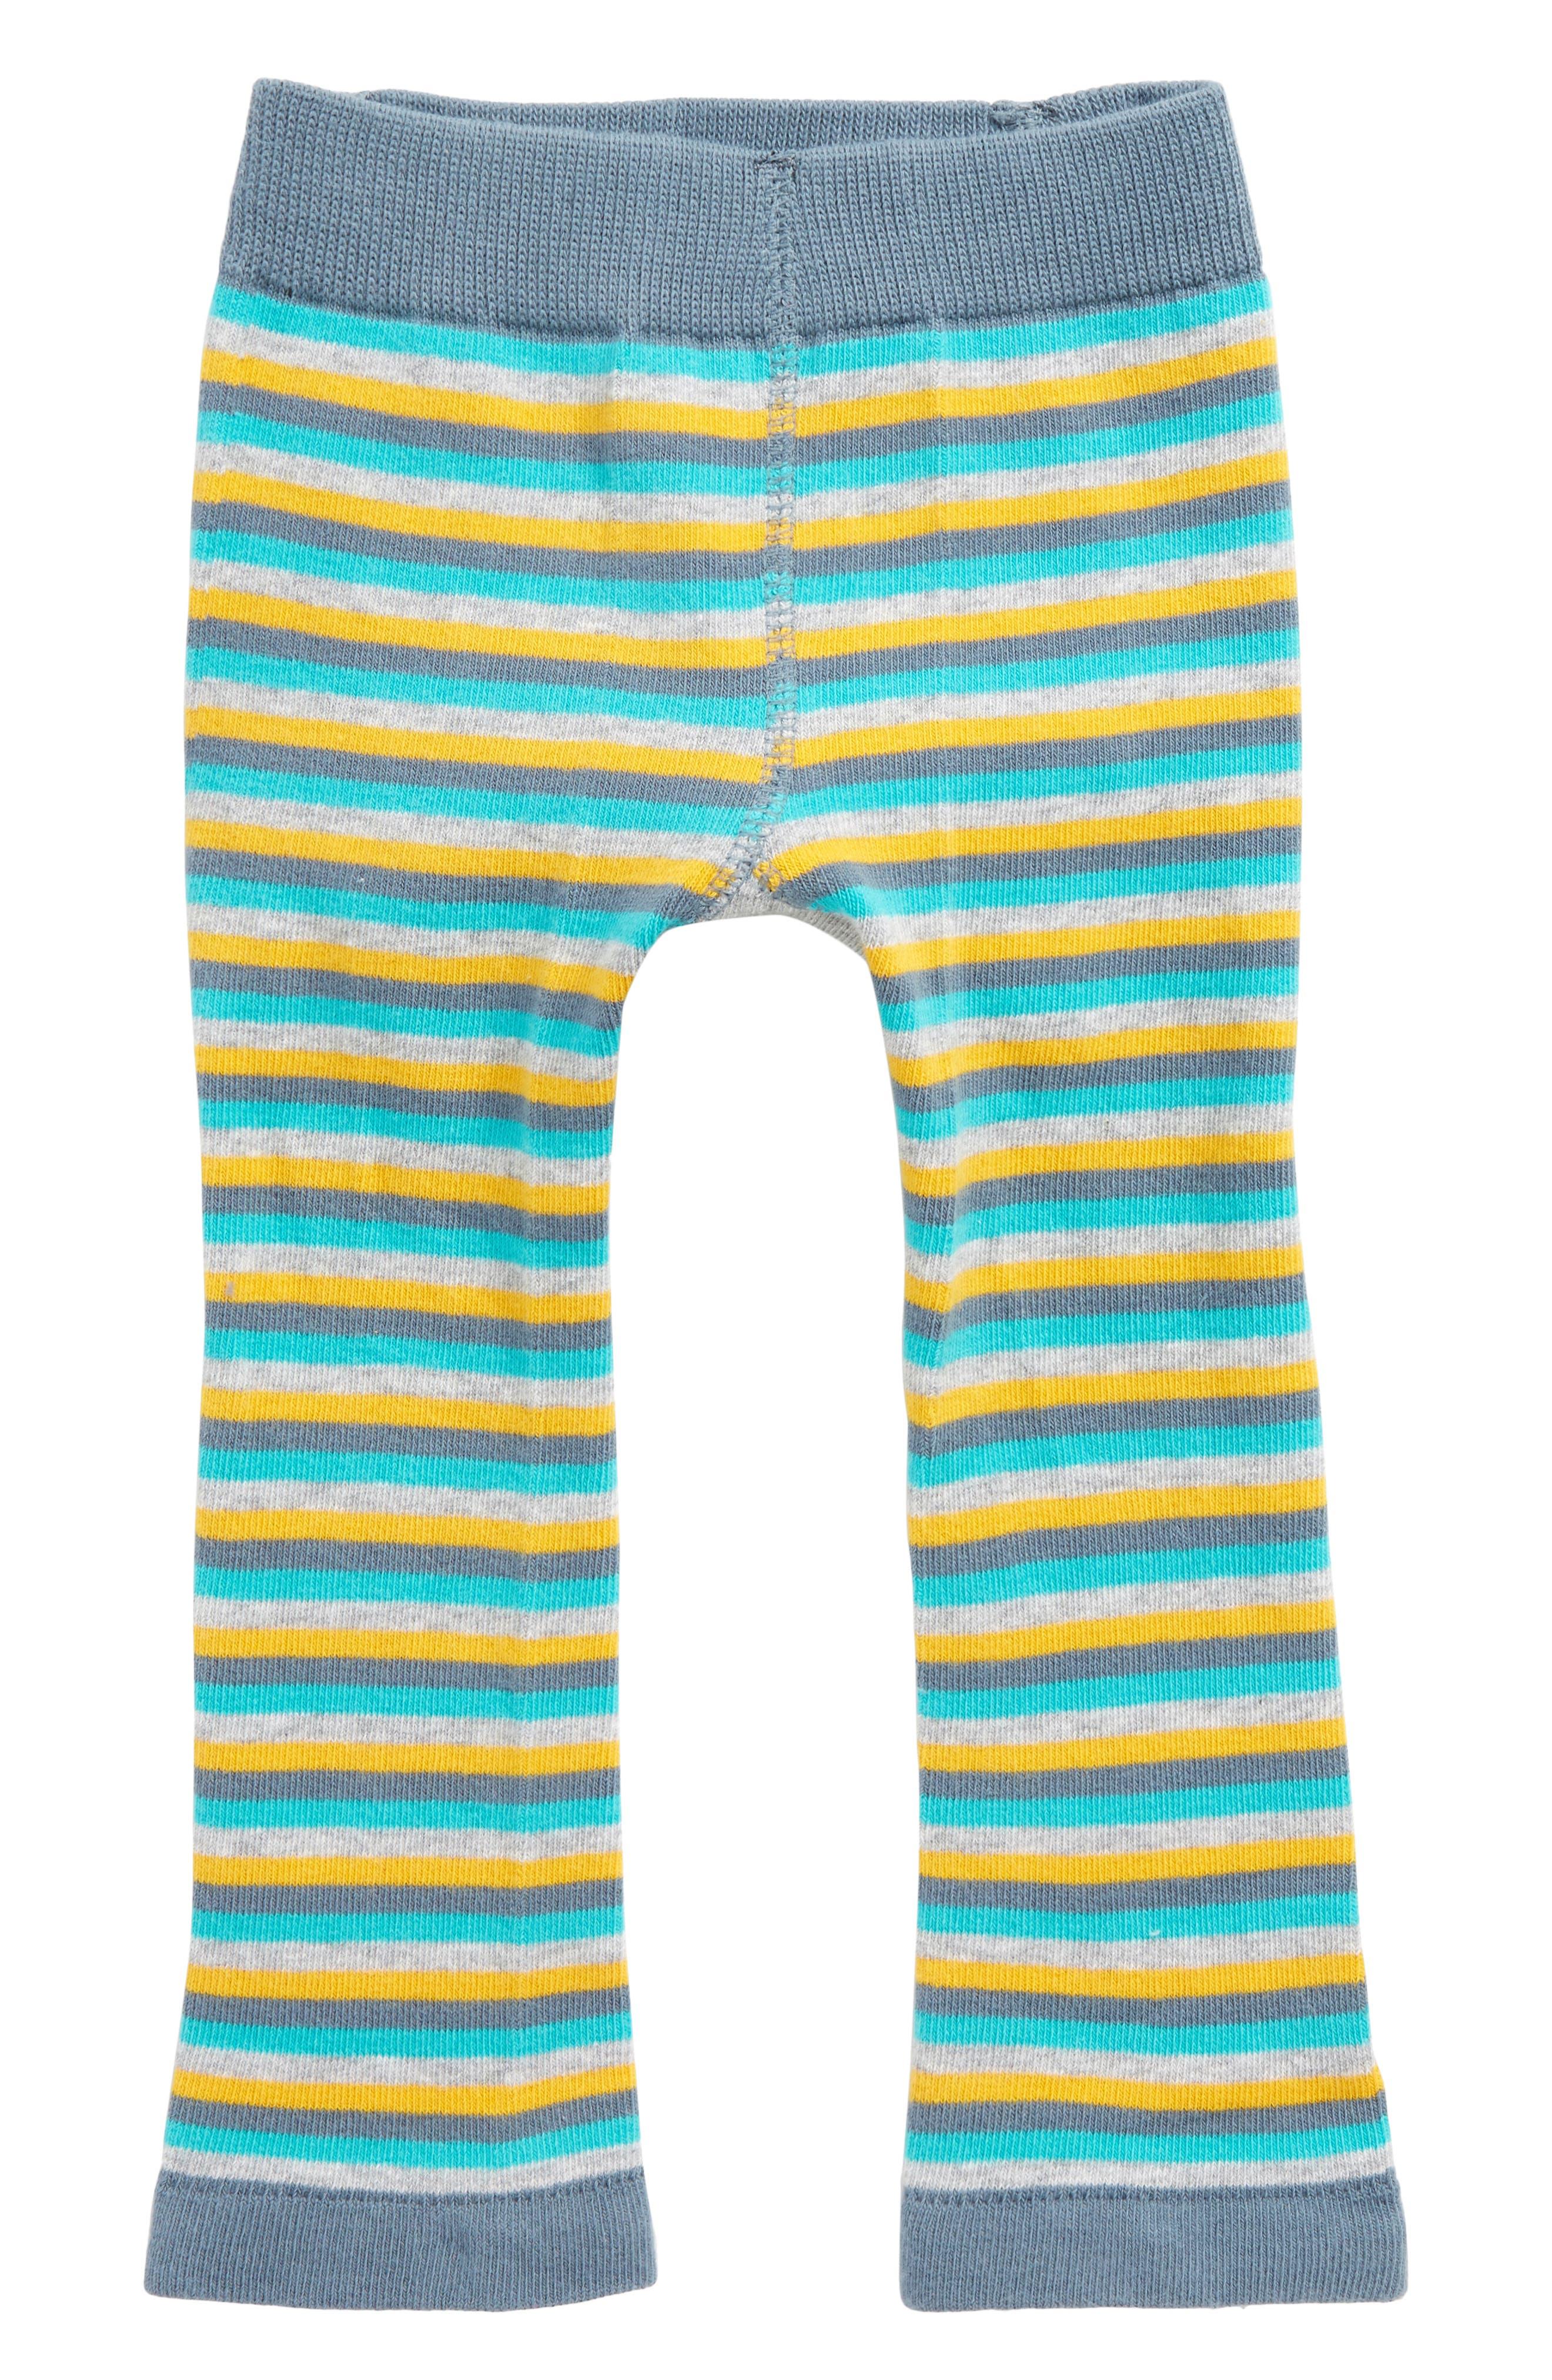 Train Leggings,                             Alternate thumbnail 3, color,                             Grey / Yellow / Blue